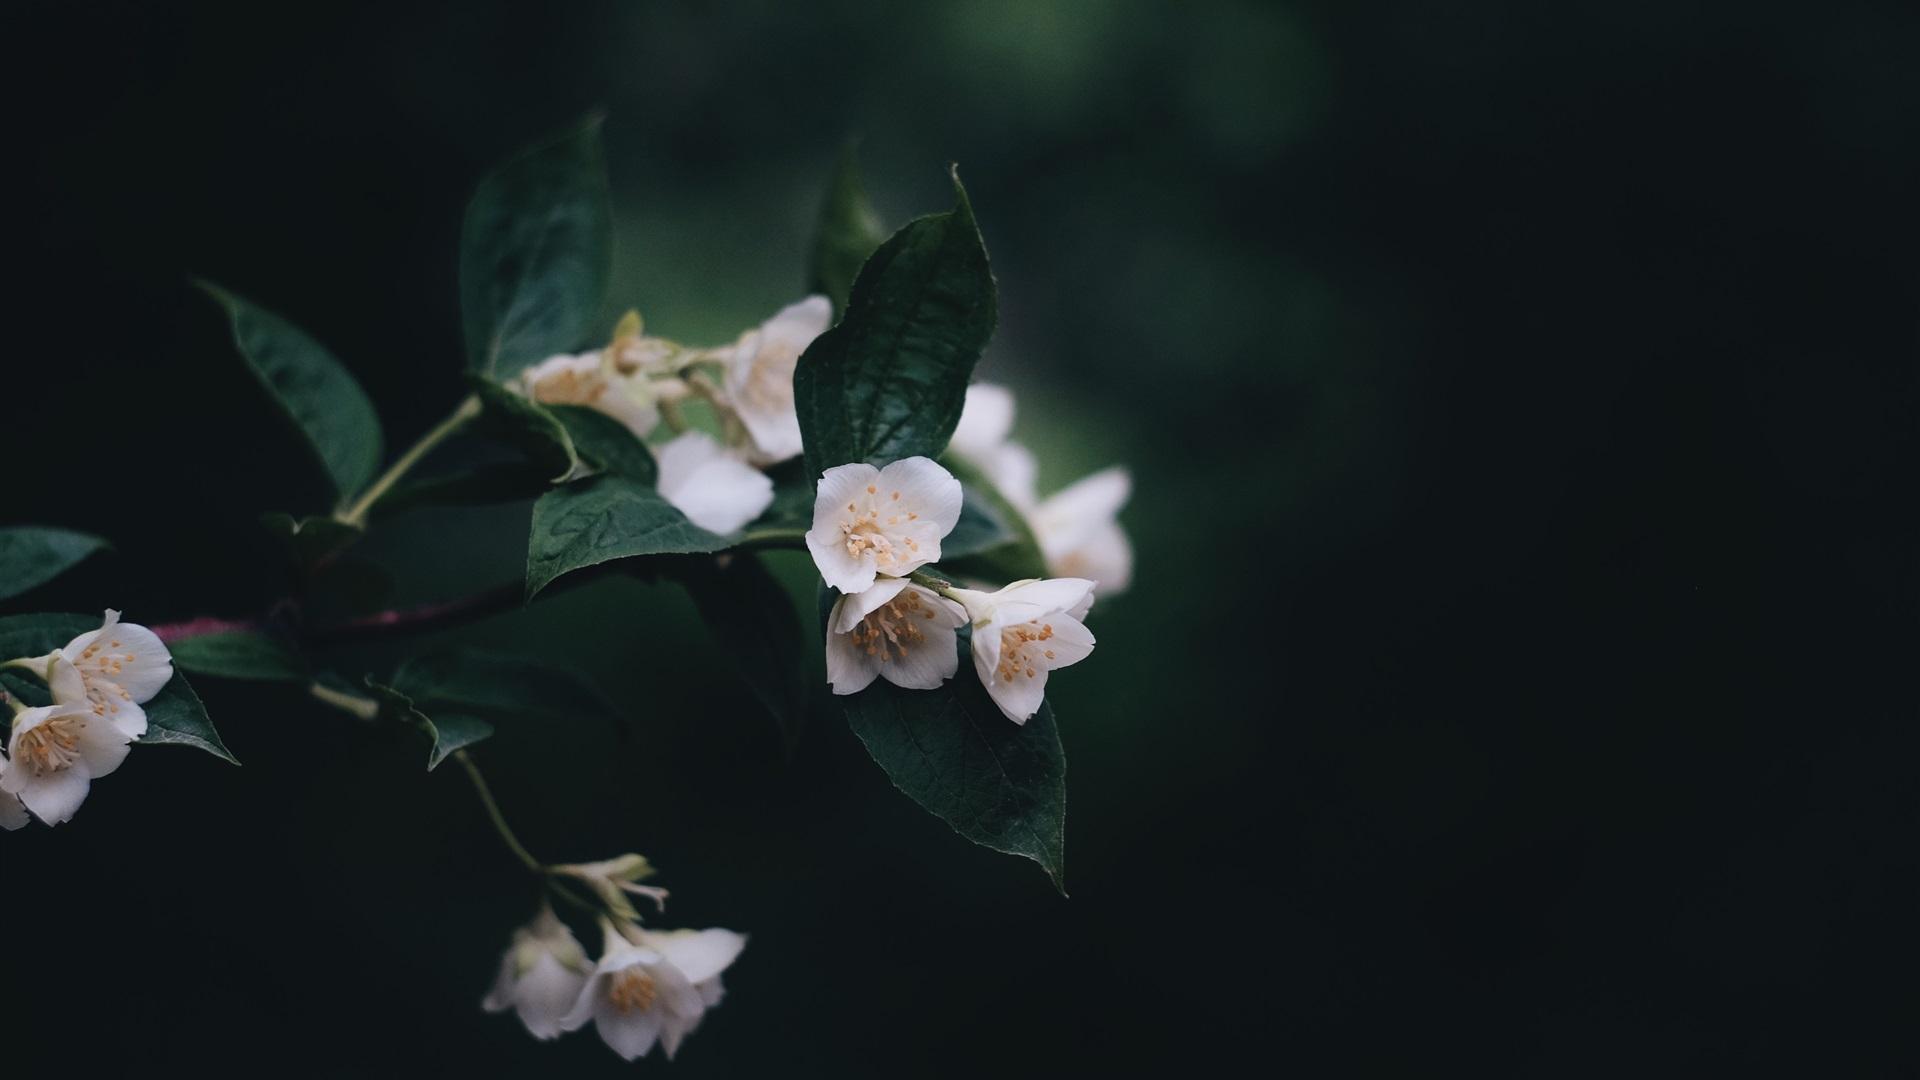 white flower wallpaper 1920x1080 - photo #28